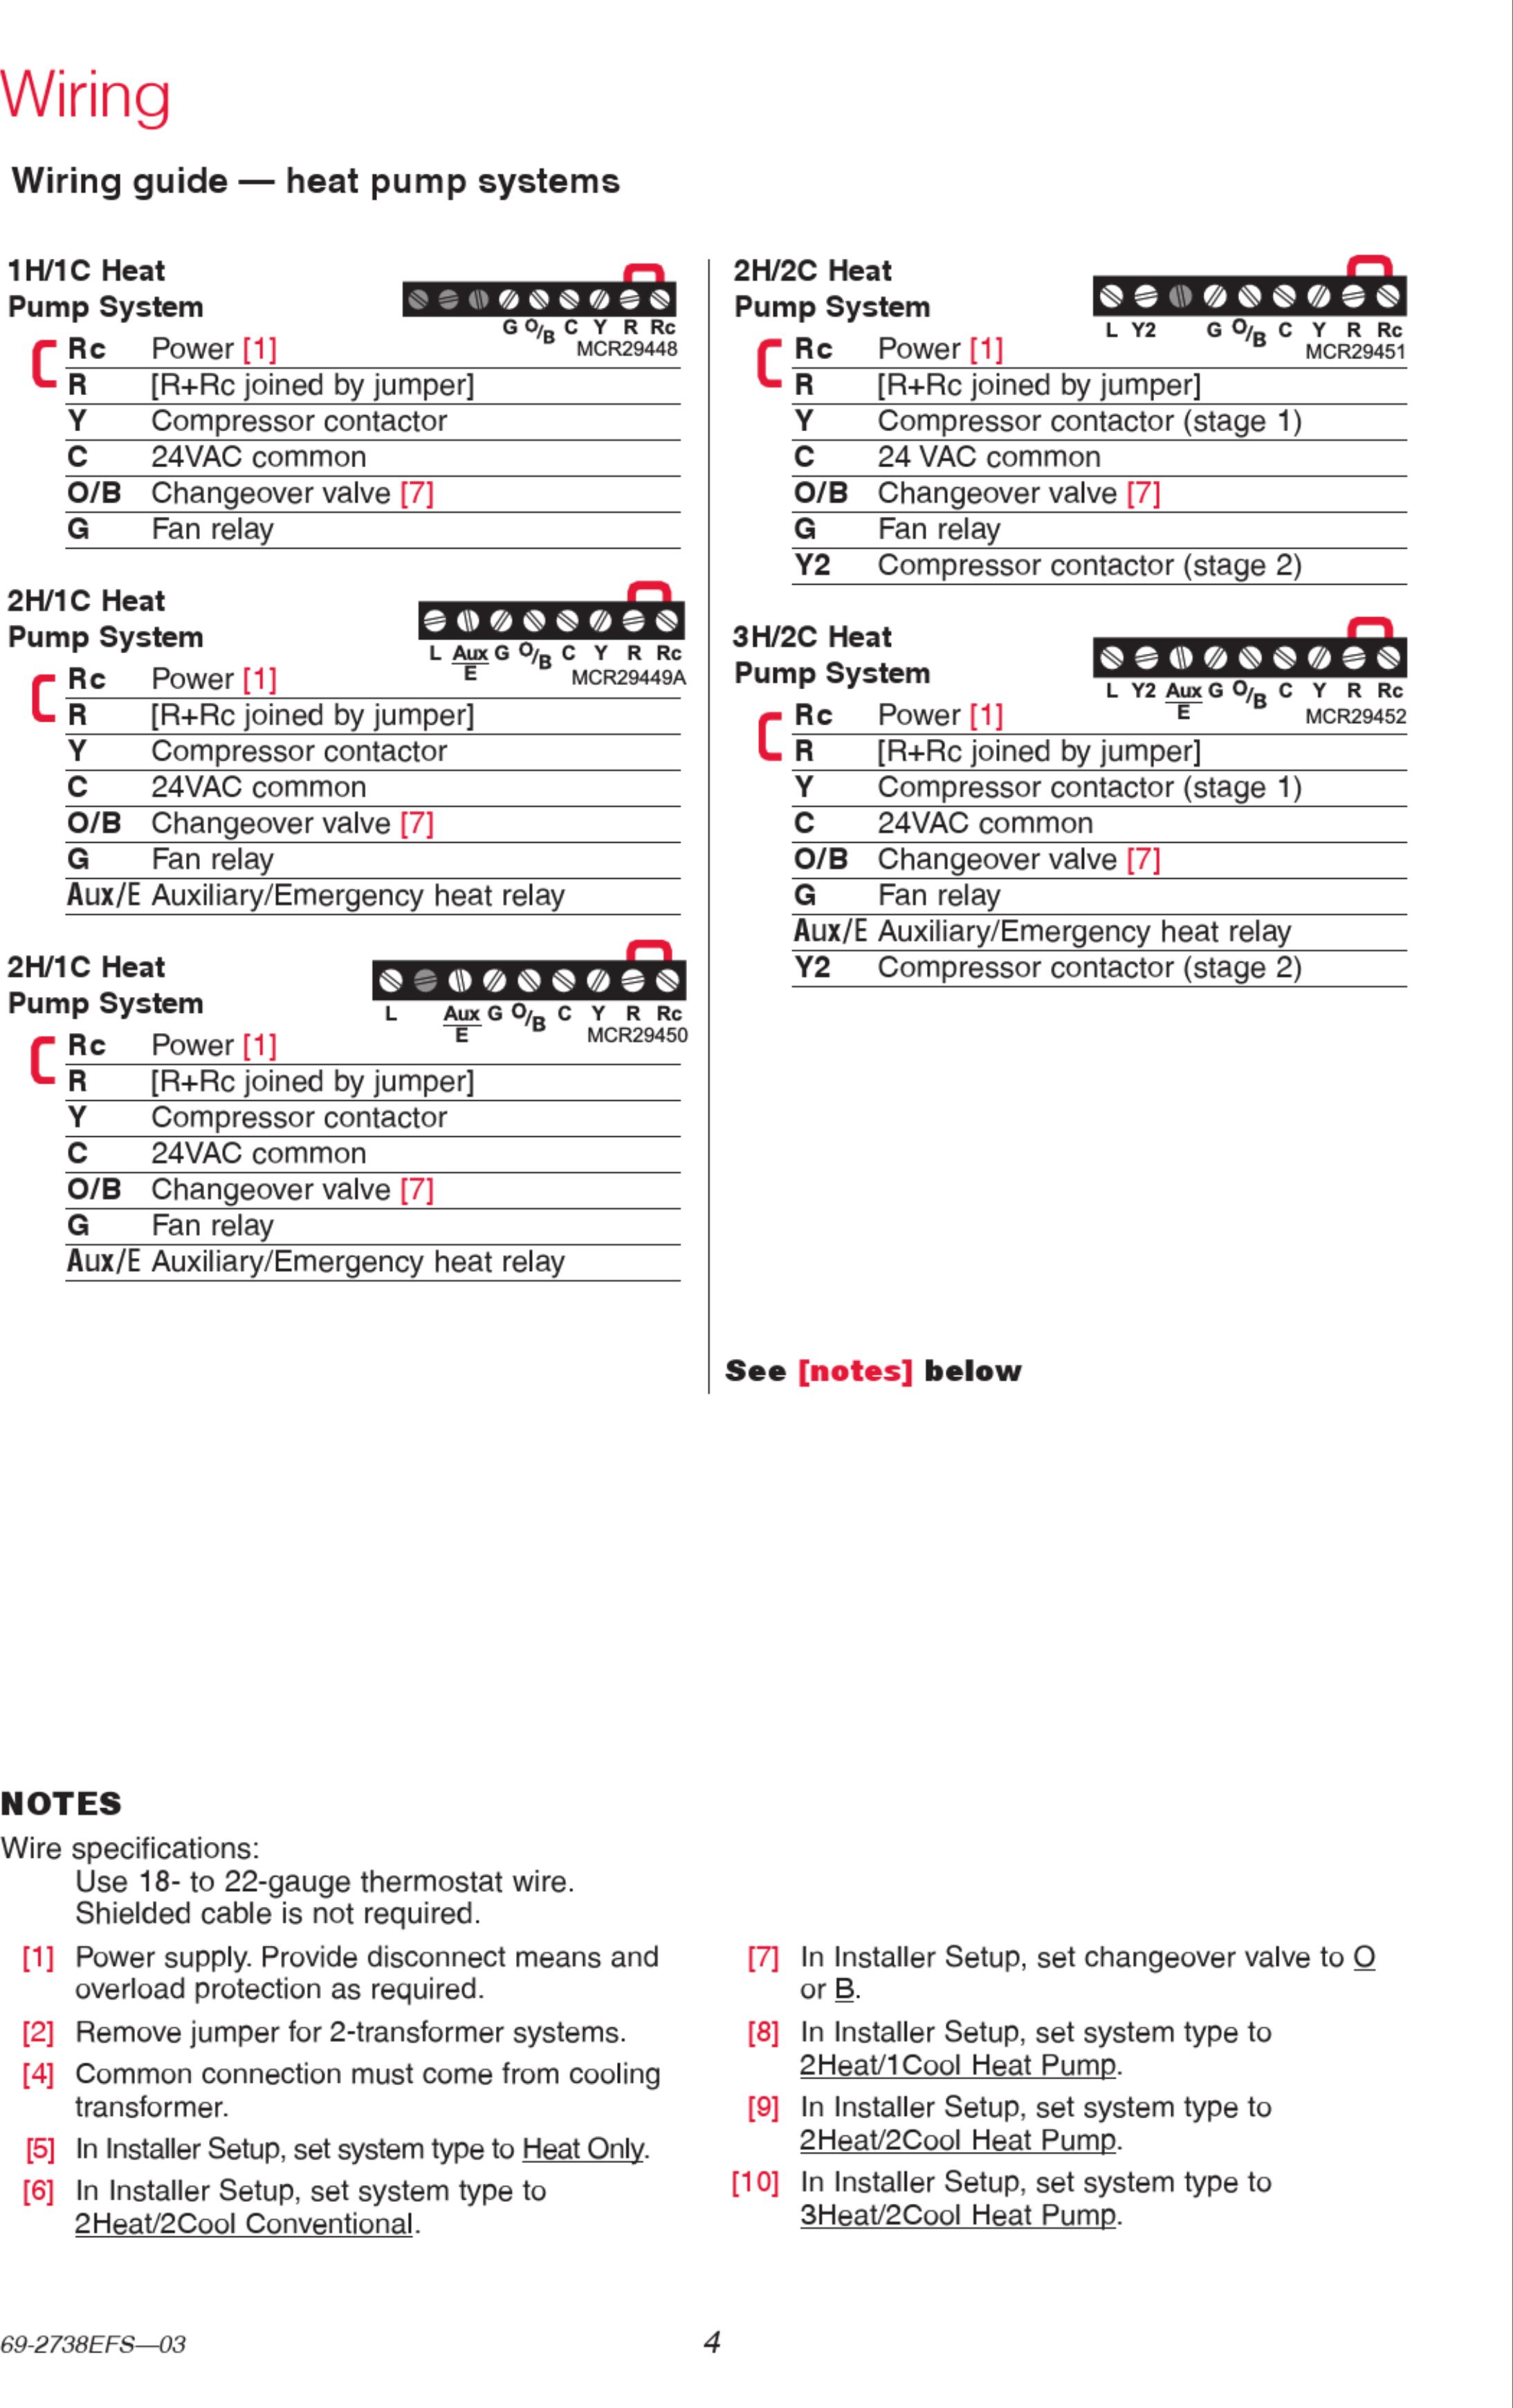 Ct110 wiring diagram efcaviationcom how to read automotive generator changeover switch wiring diagram queensland honeywellfocusproth6000seriesinstallationmanual1002892 generator changeover switch wiring diagram cheapraybanclubmaster Choice Image